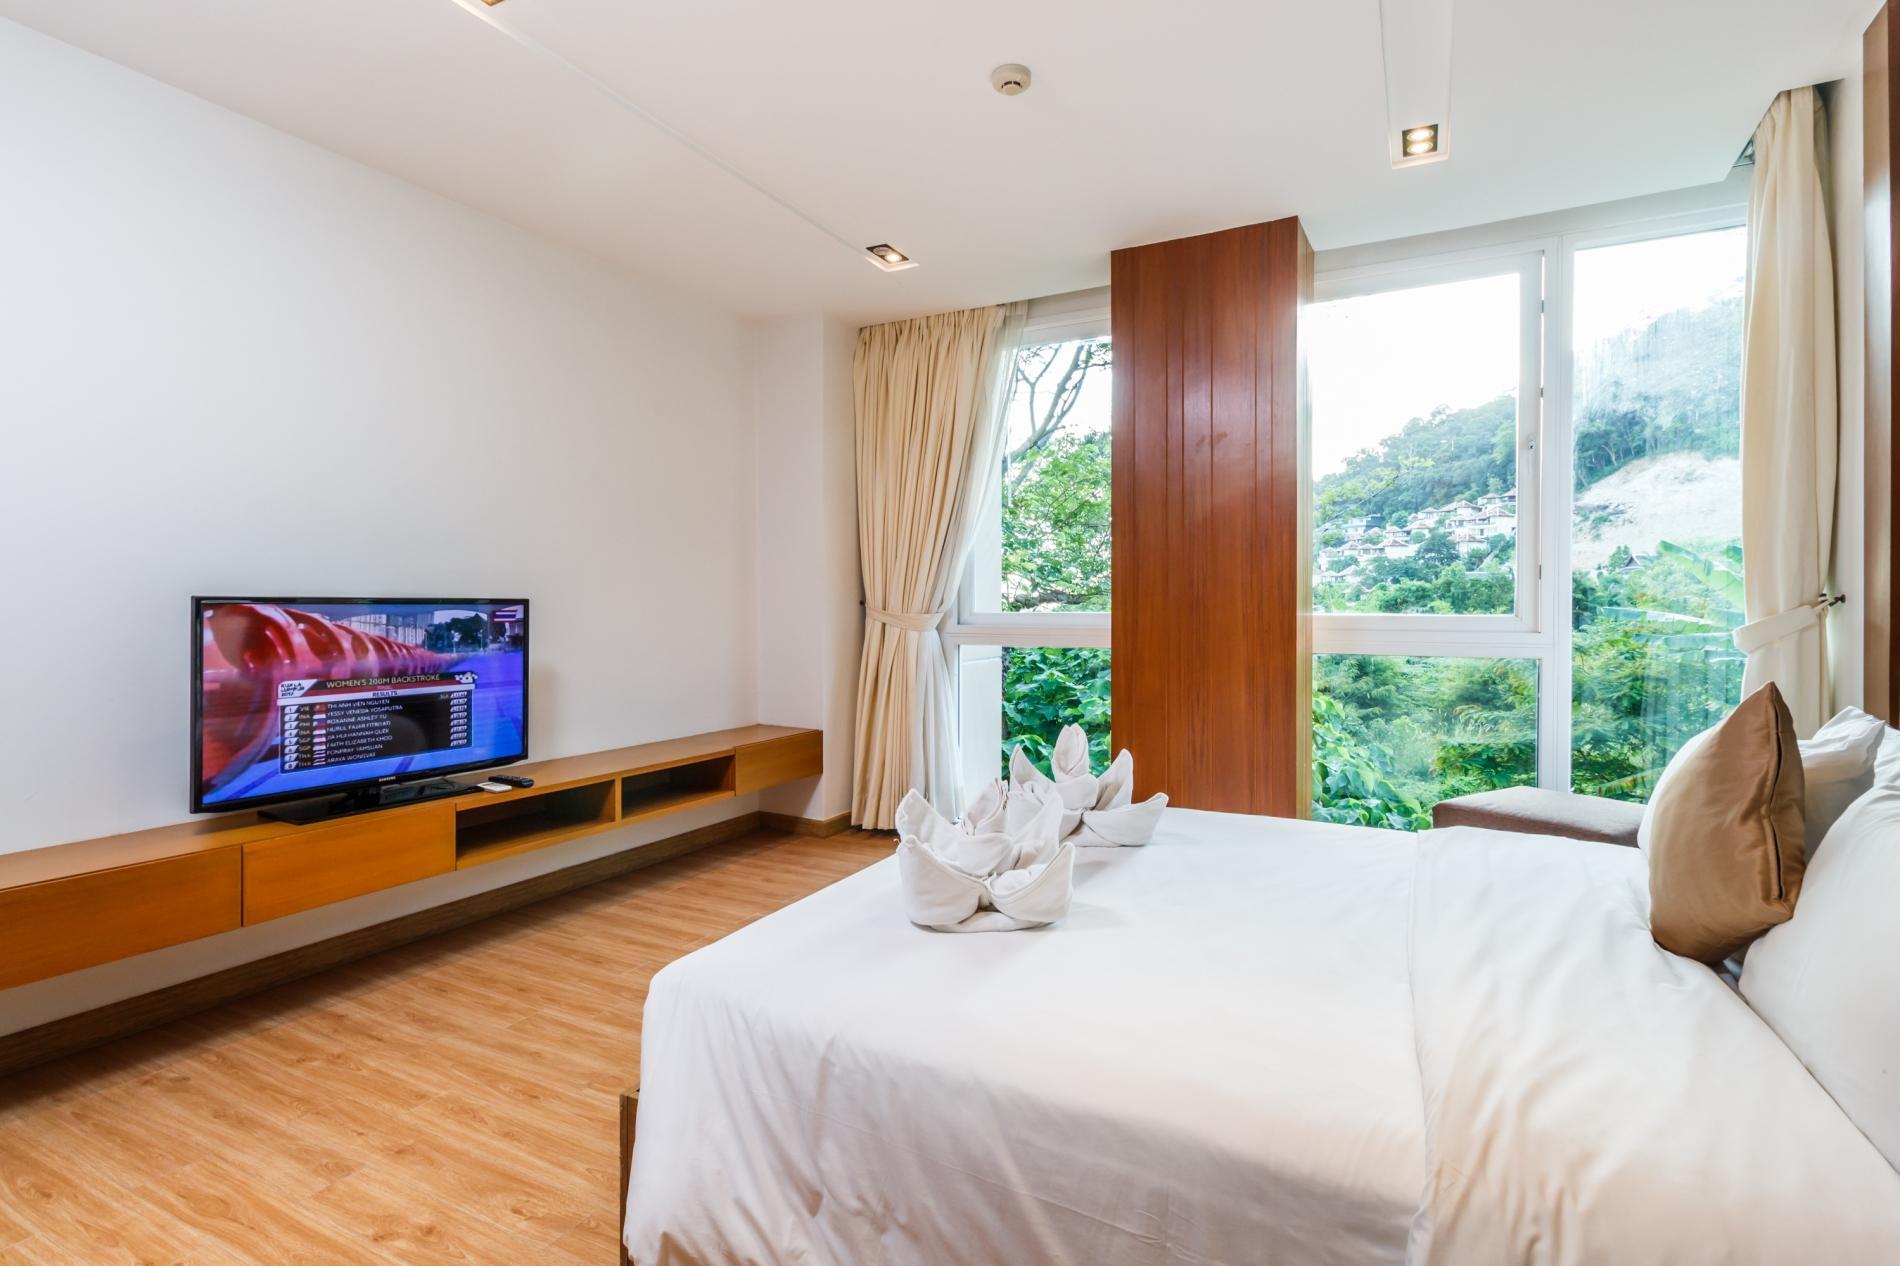 Apartment Privilege12 - Seaview 3 bedroom luxury apartment on Kalim bay photo 20384363